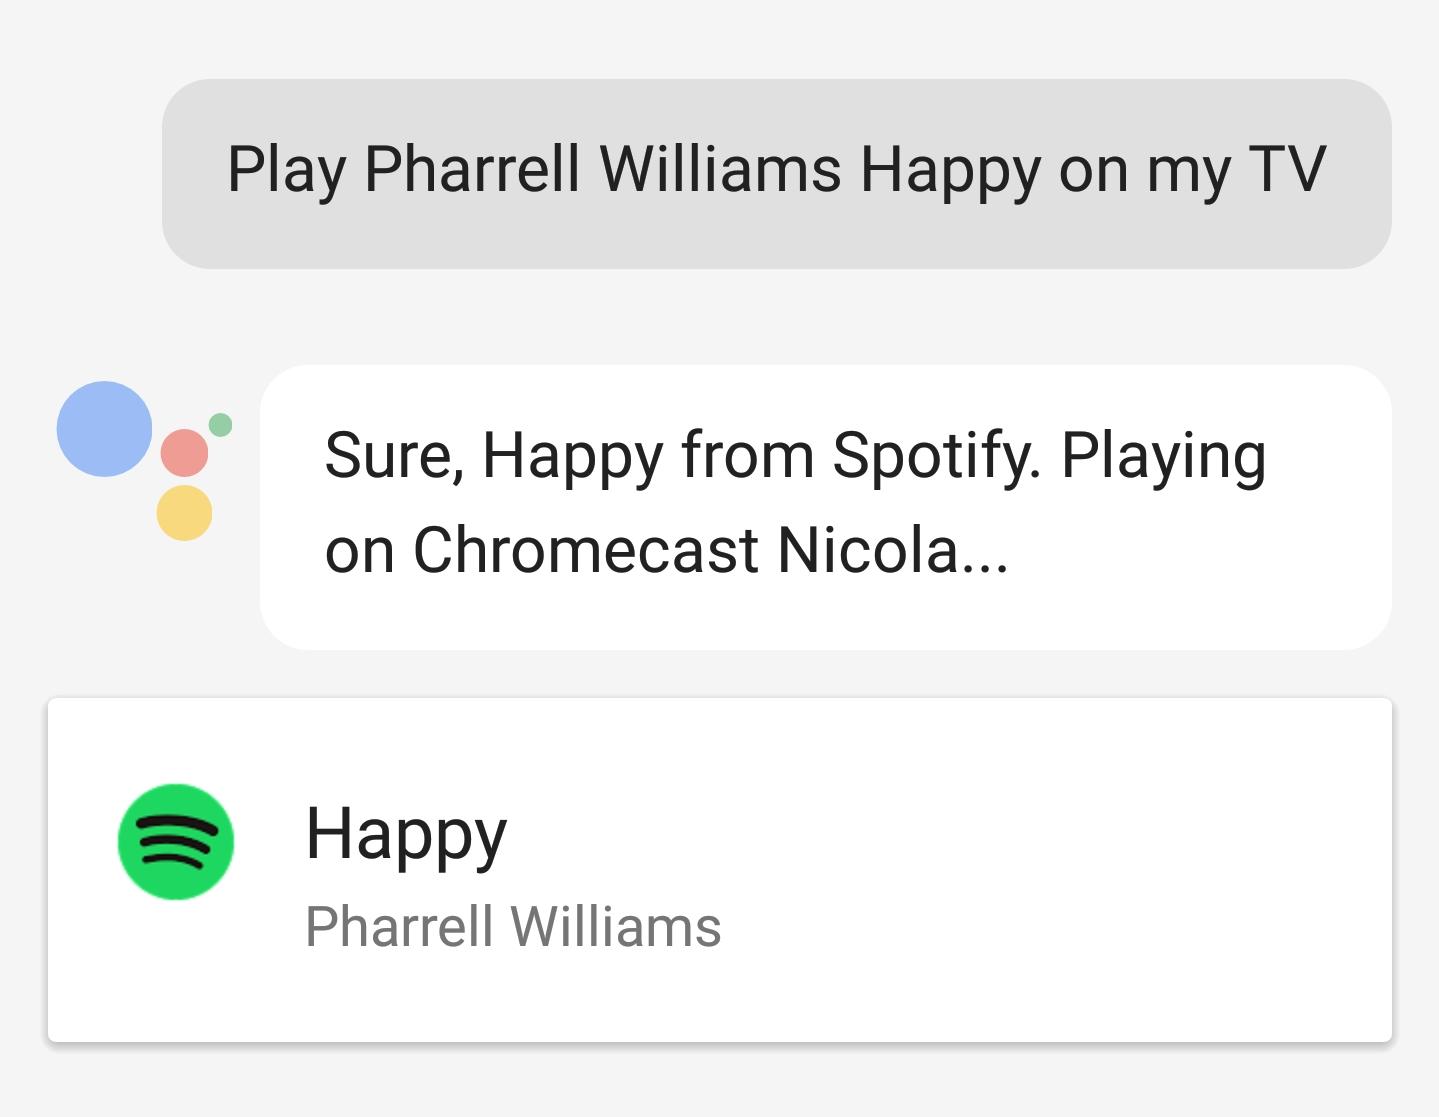 Praise Slow Google] It's now possible to control Chromecast